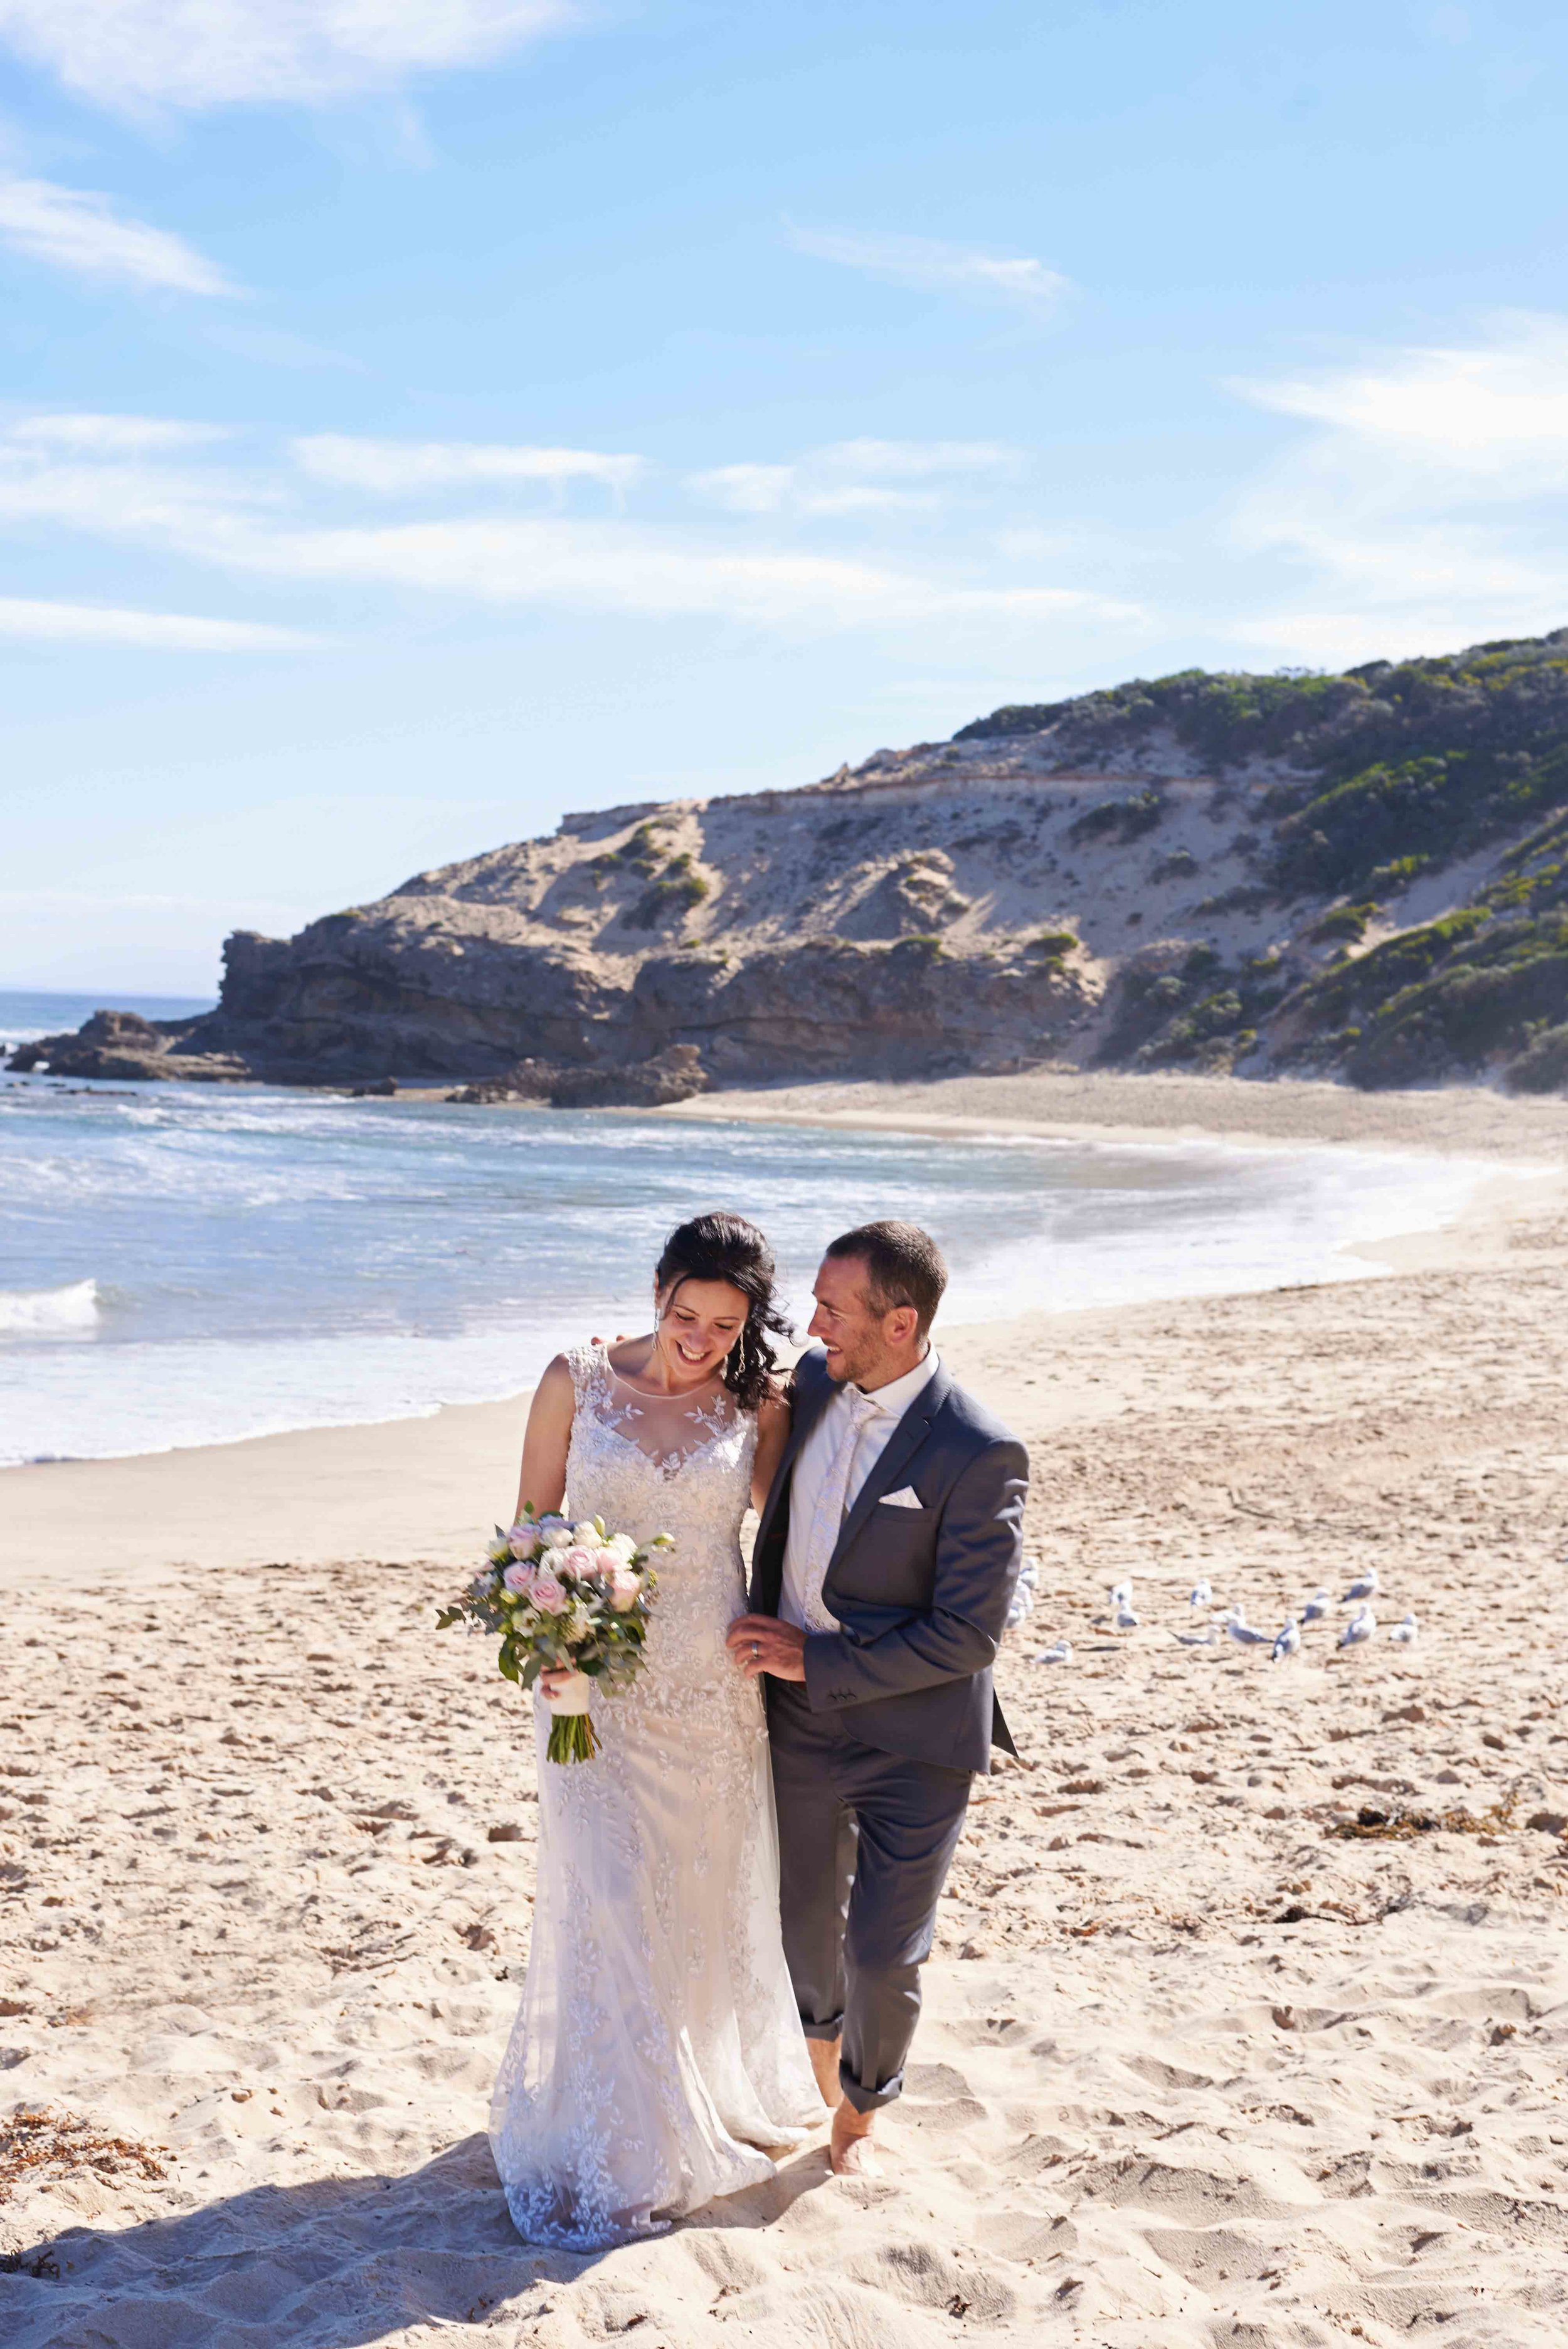 sorrento-wedding-photography-all-smiles-marissa-jade-photography-119.jpg